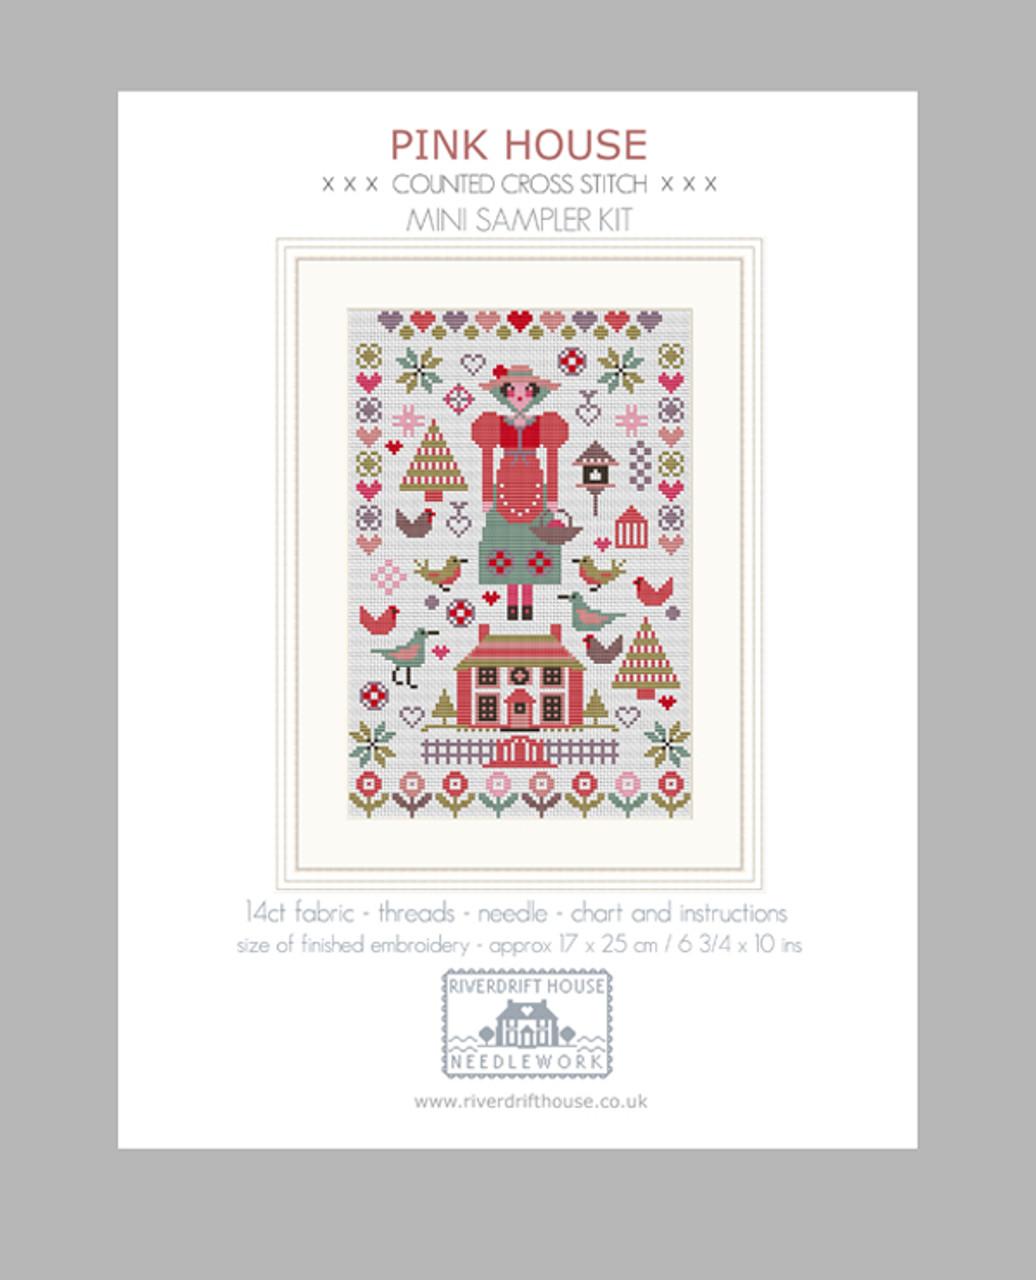 MINI AUTUMN COUNTED CROSS STITCH KIT by RIVERDRIFT HOUSE